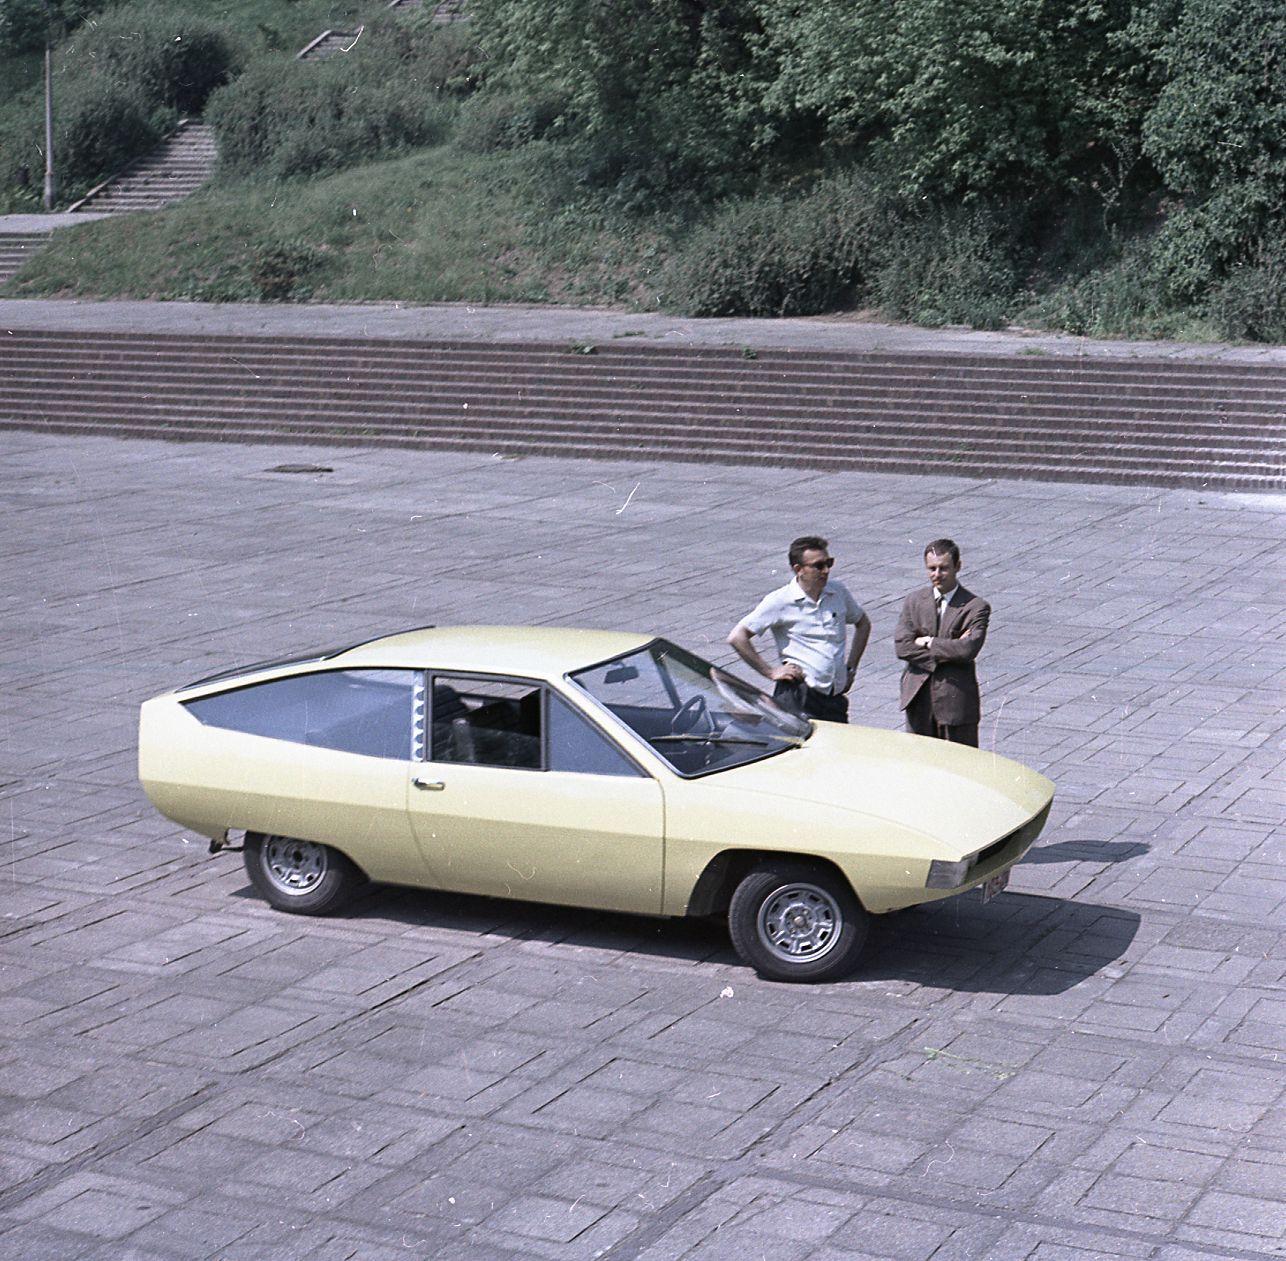 Polski Fiat 125p Coupe Prototype Mai 1971 Cree Par Le Bureau D